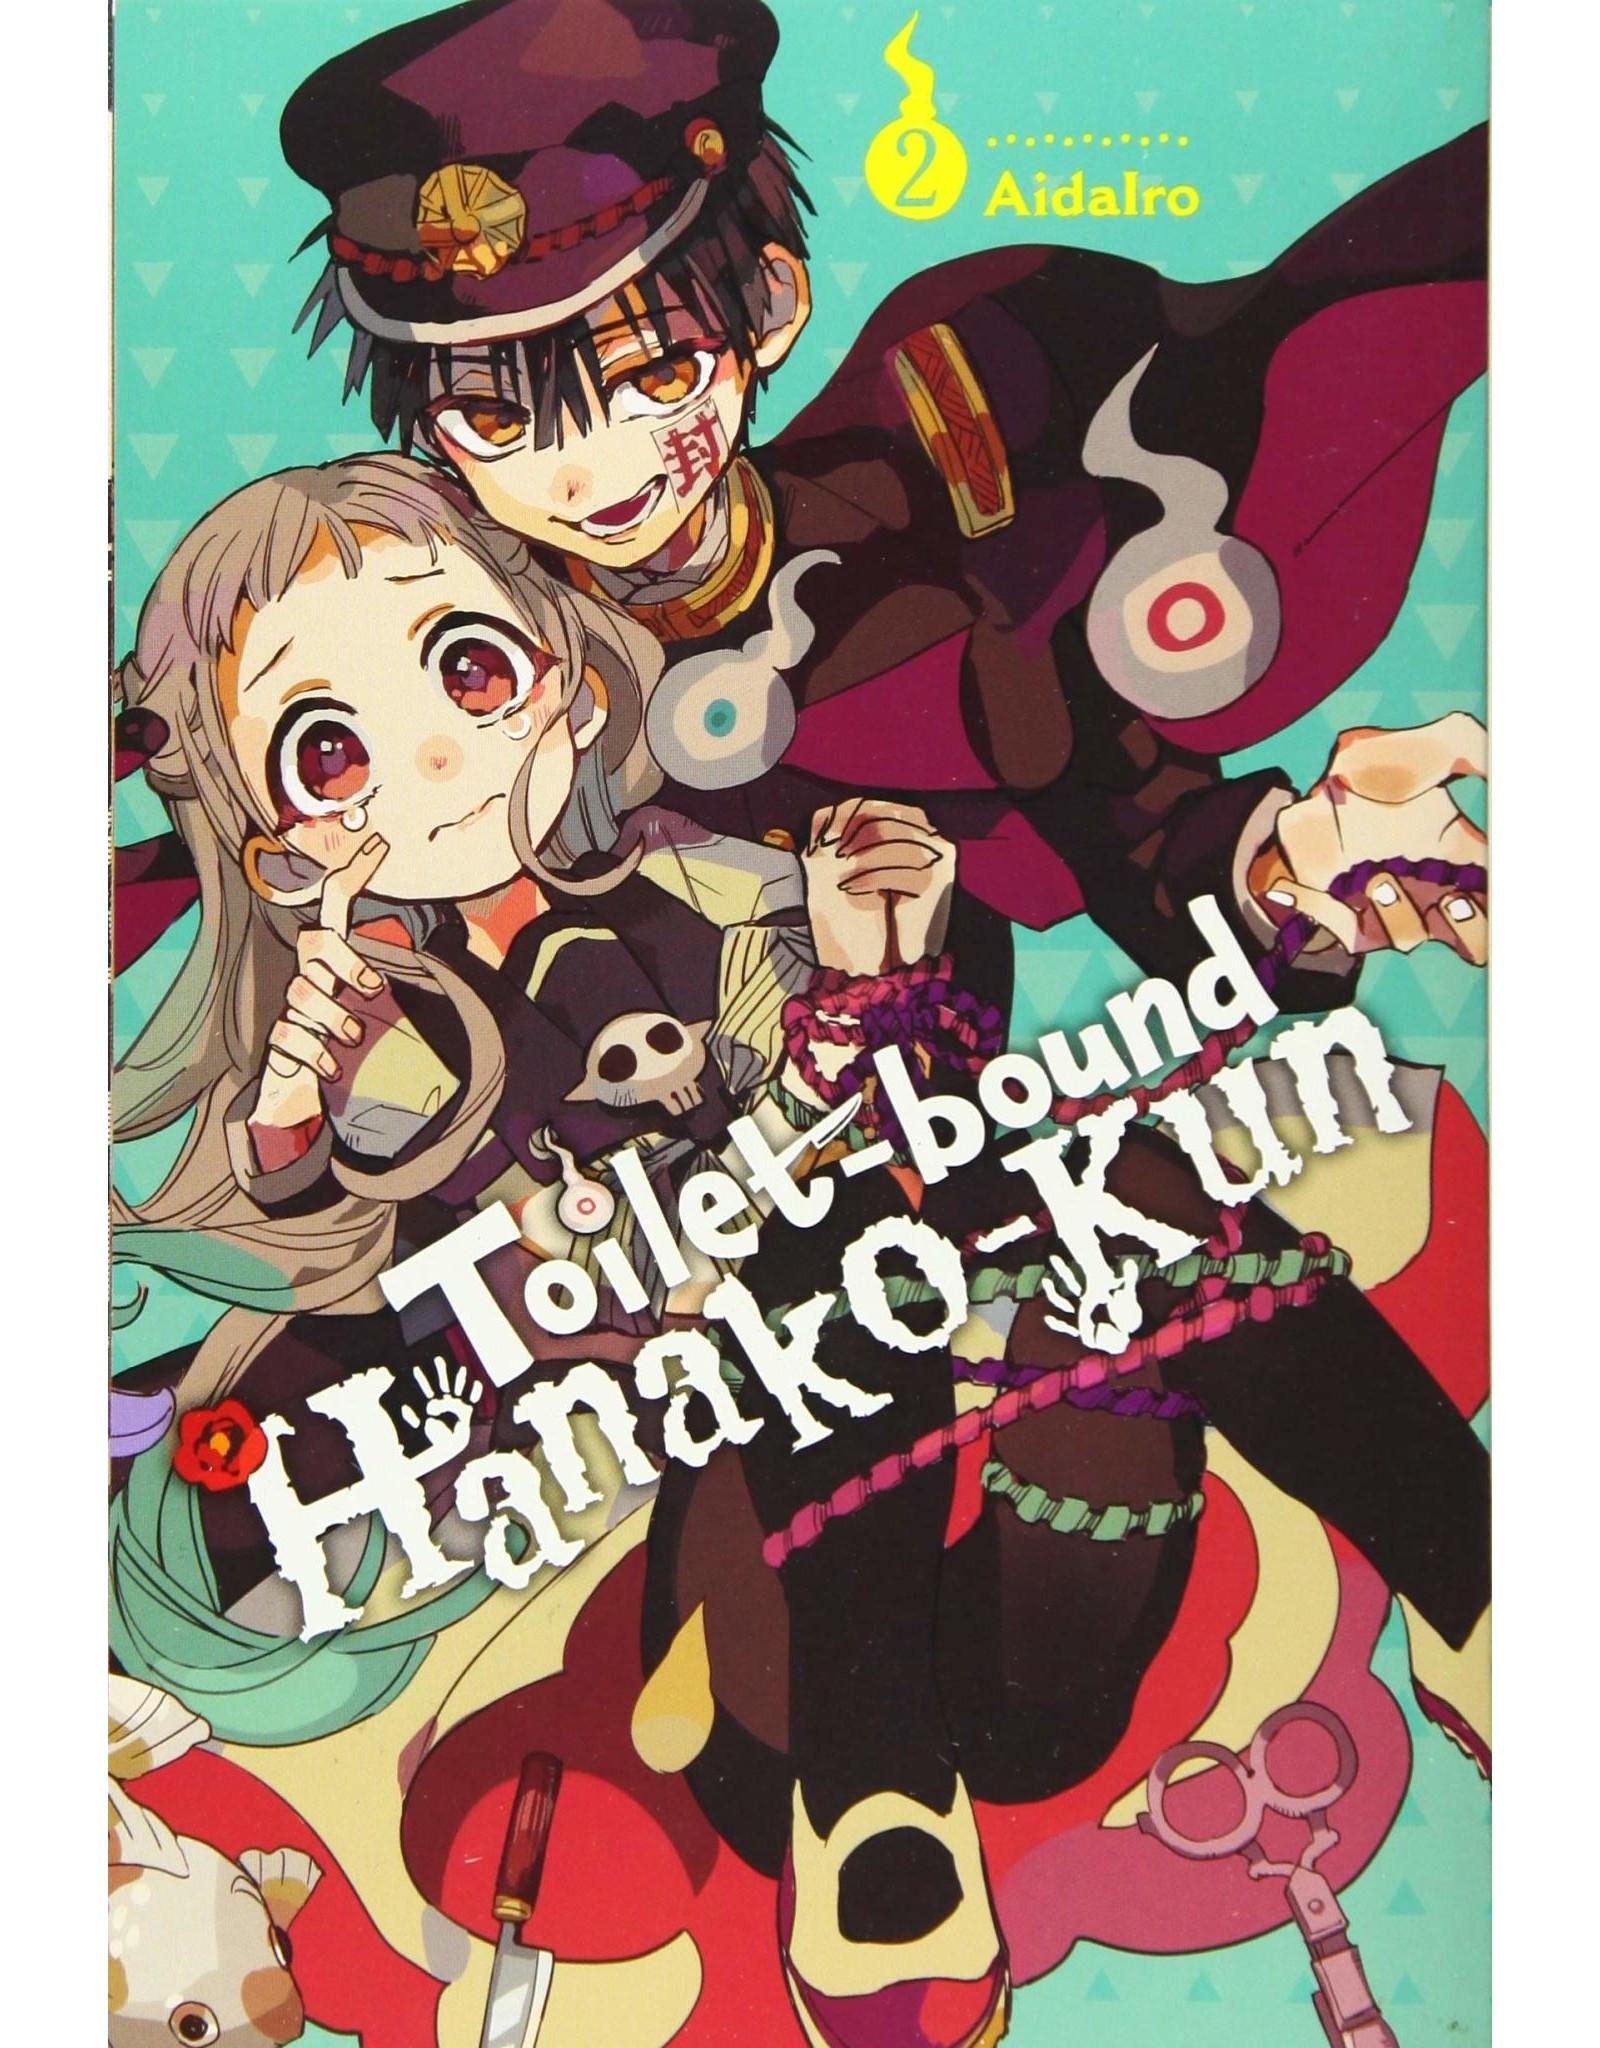 Toilet-Bound Hanako-Kun 2 (Engelstalig)